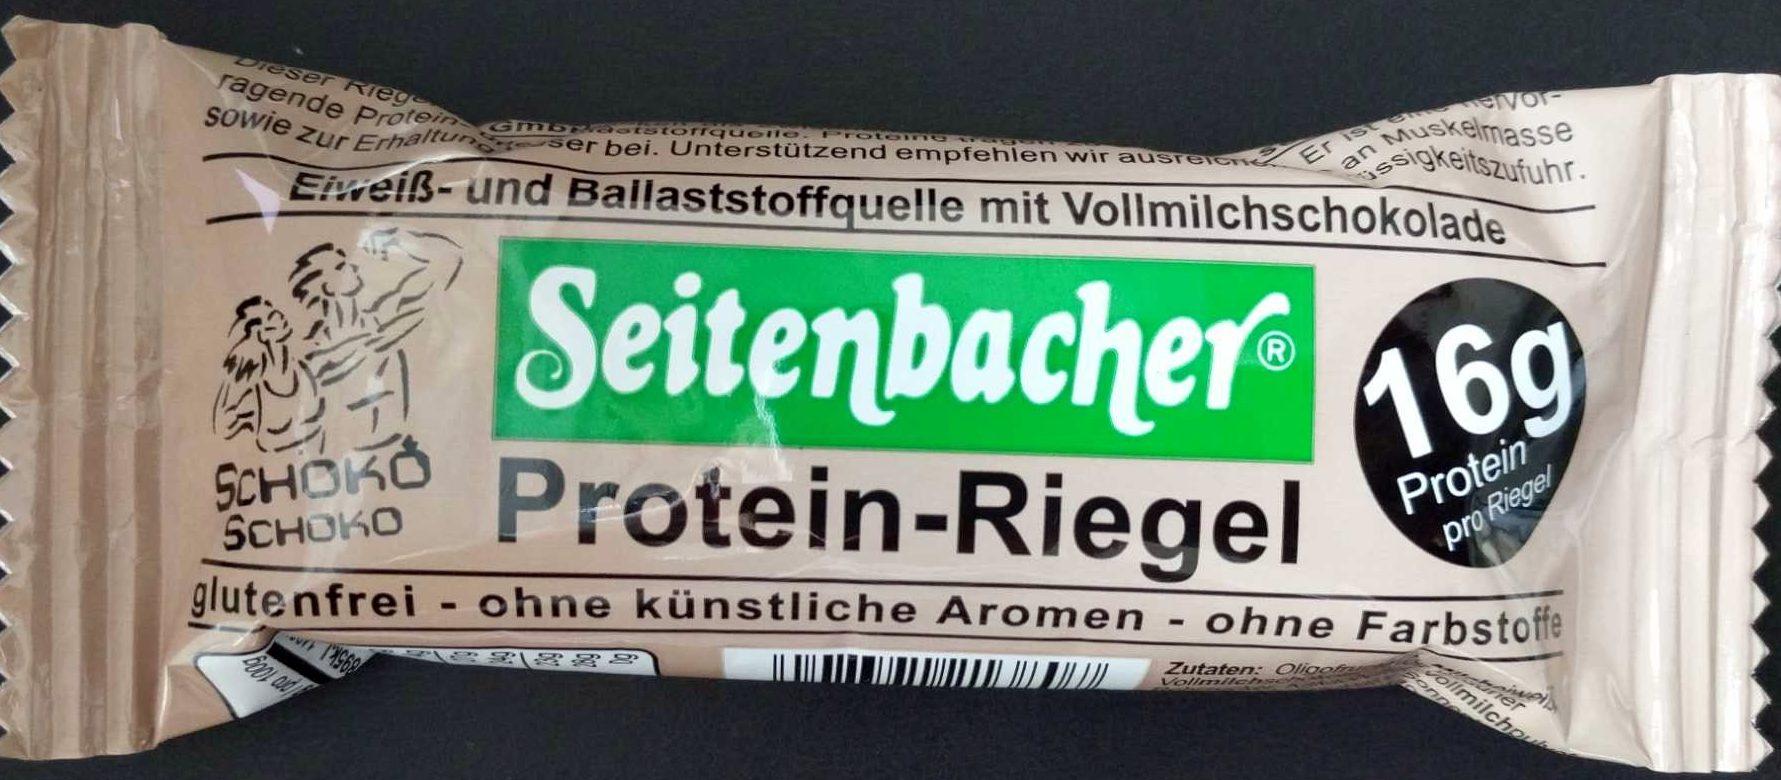 Protein-Riegel - Prodotto - en